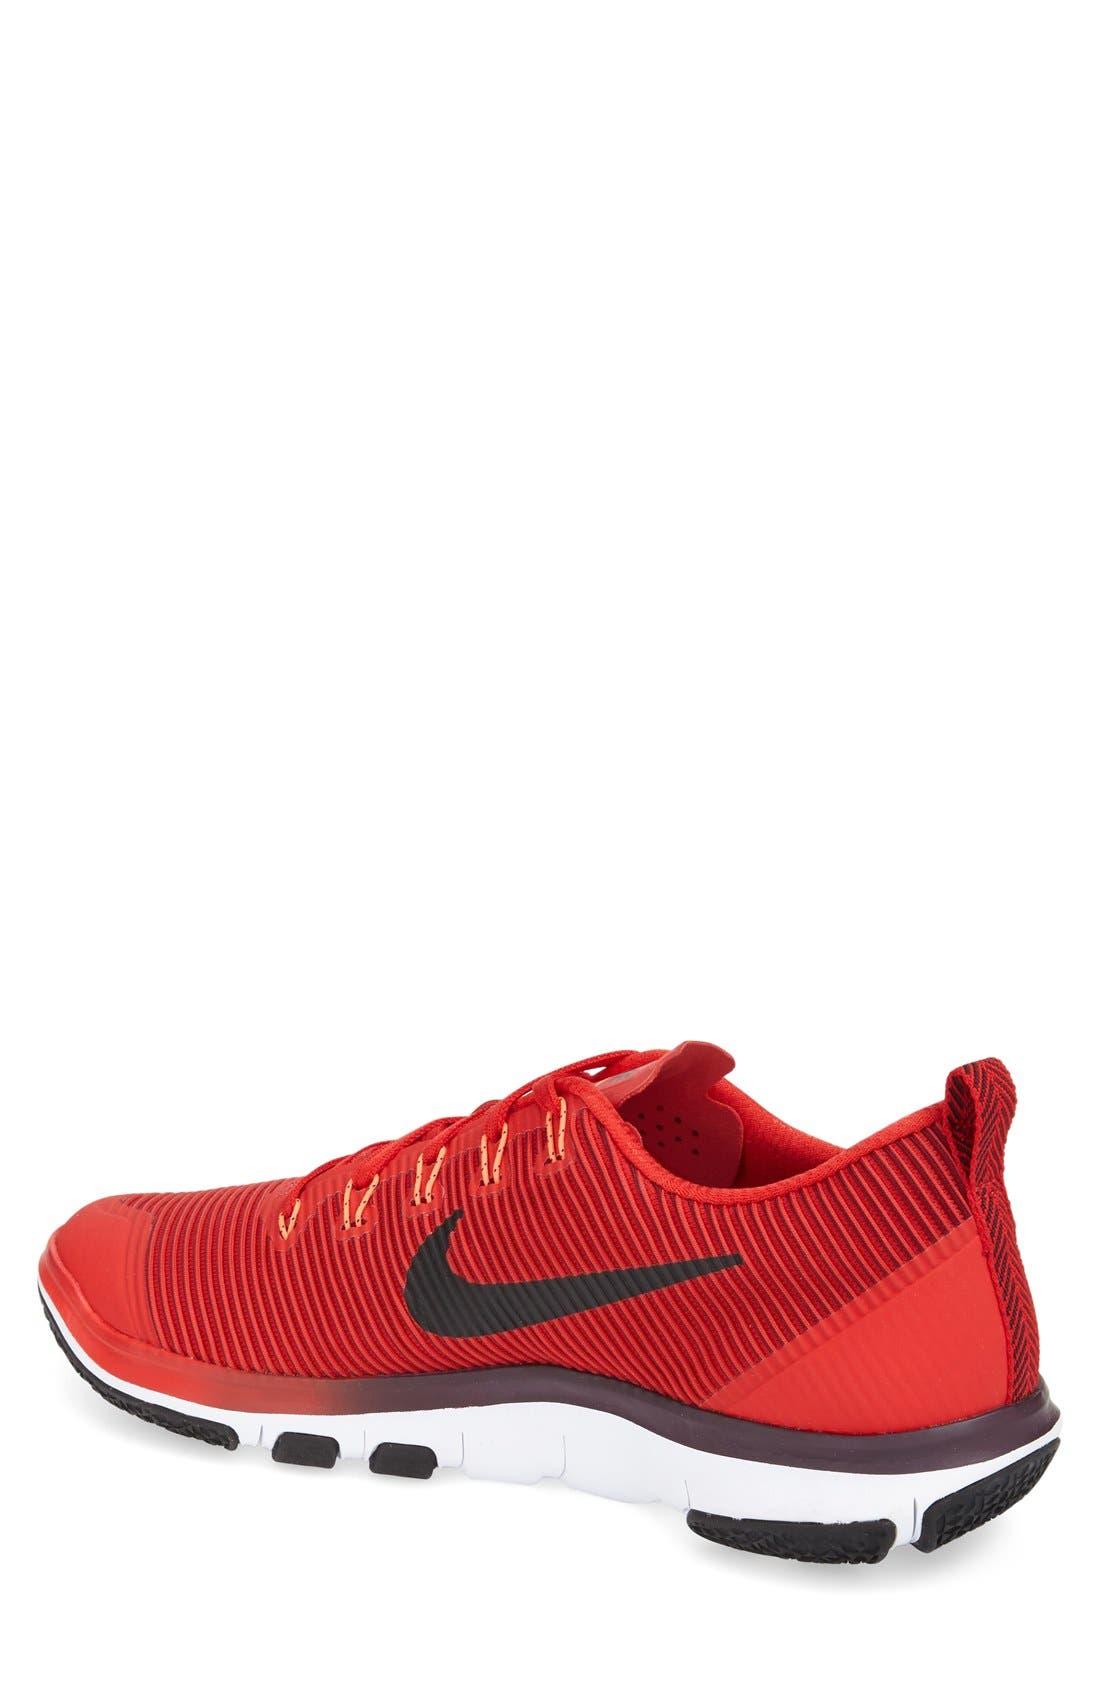 Alternate Image 2  - Nike 'Free Train Versatility' Training Shoe (Men)